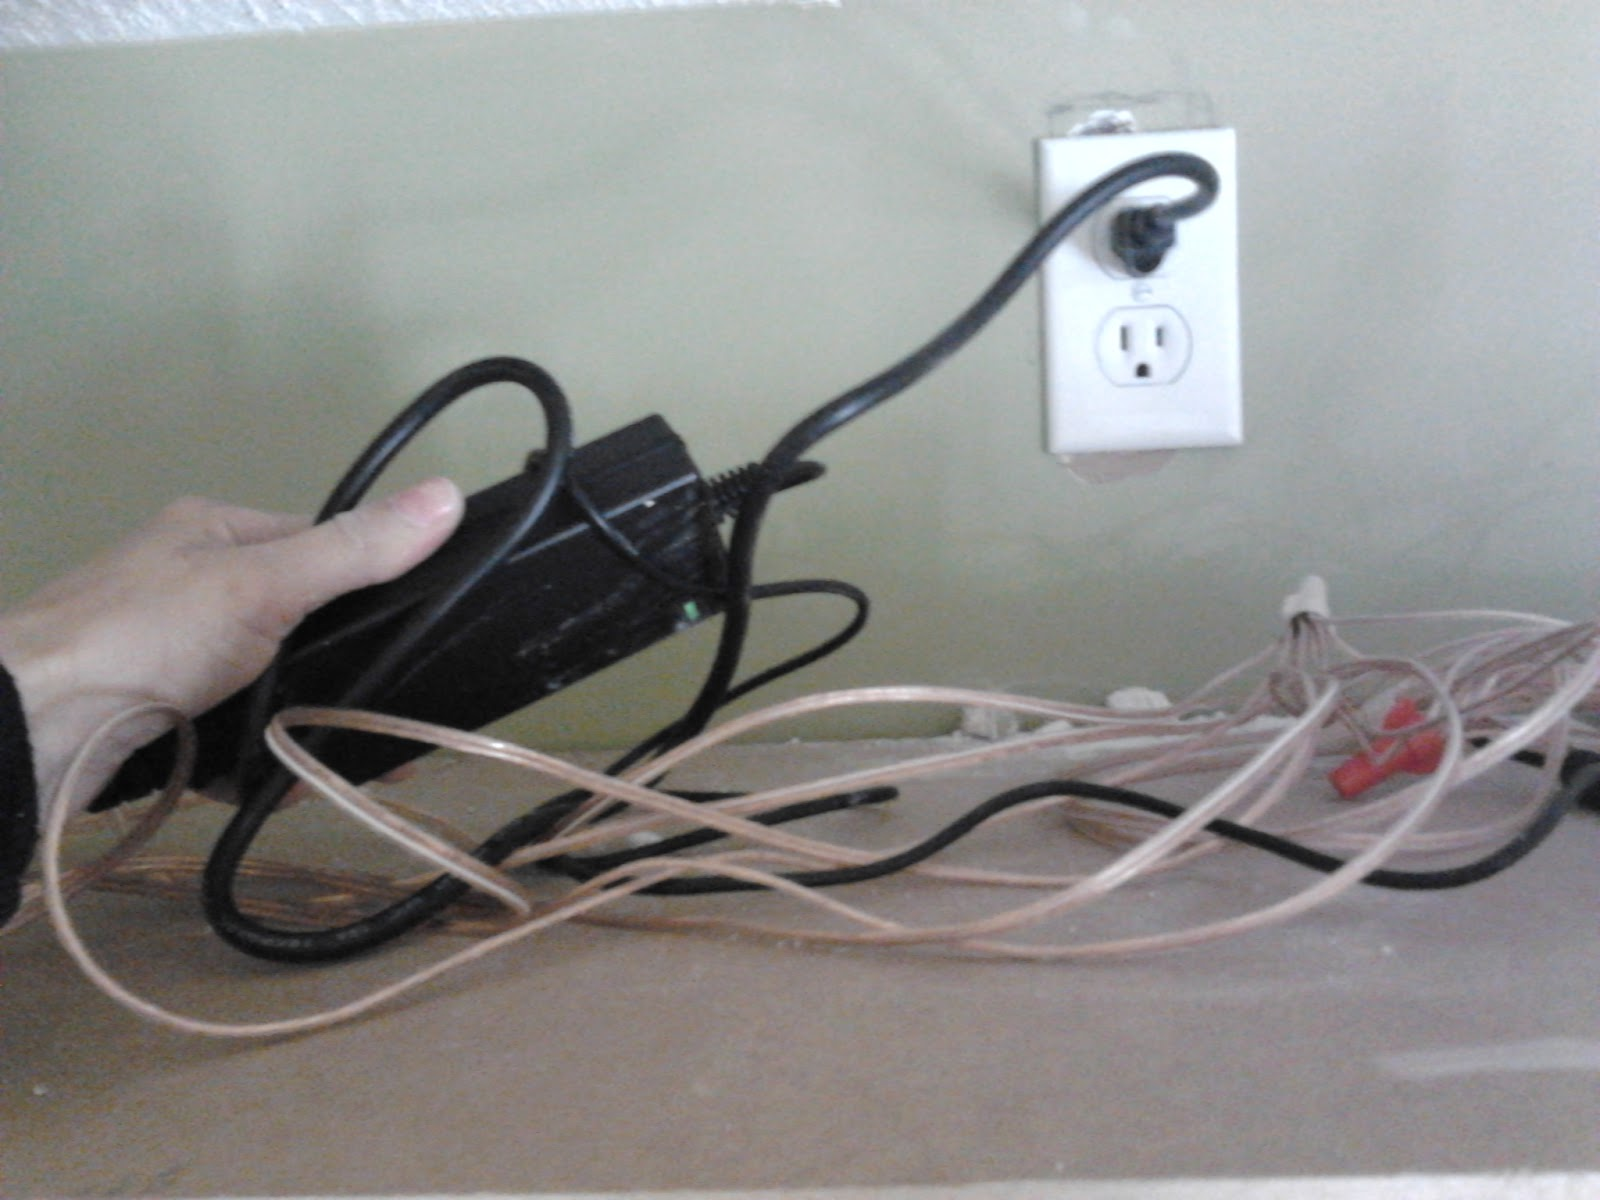 wiring led light up [ 1600 x 1200 Pixel ]